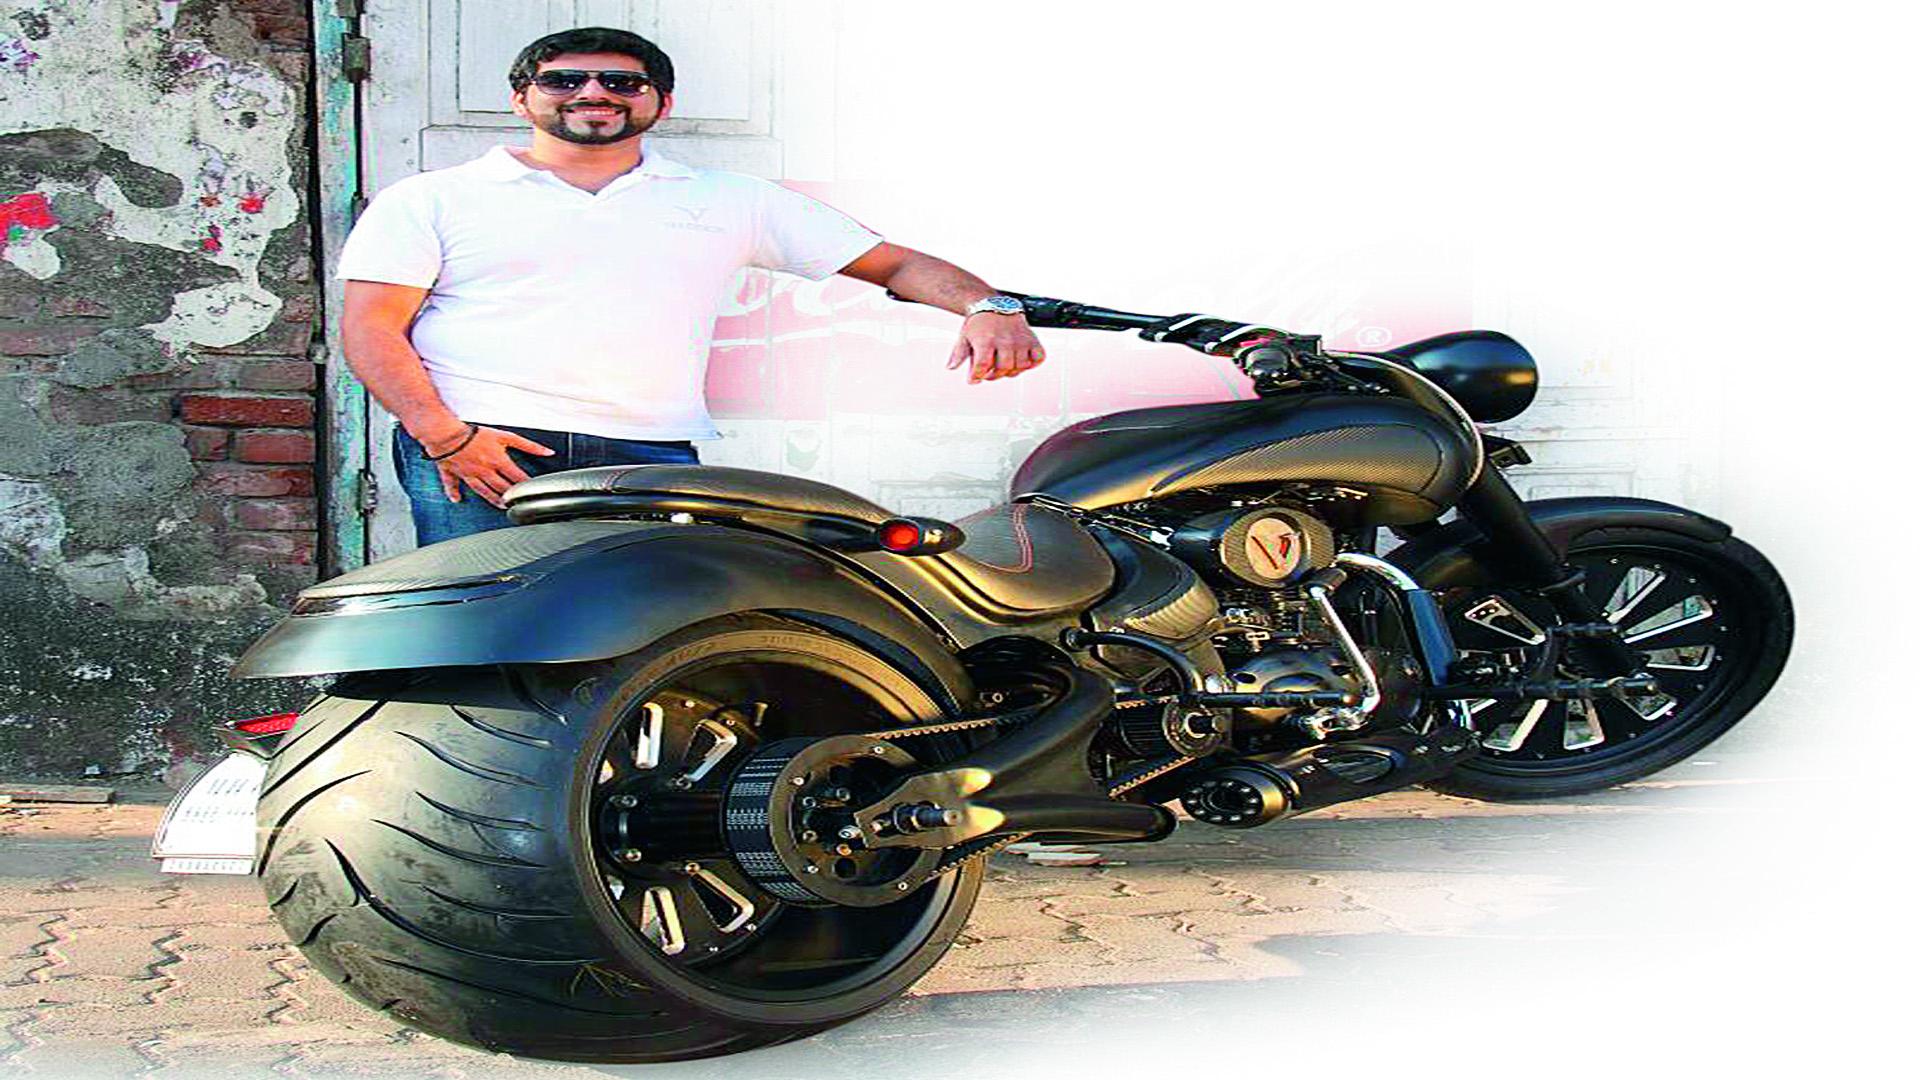 Bike doom sticker design - Headturner Akshai Varde